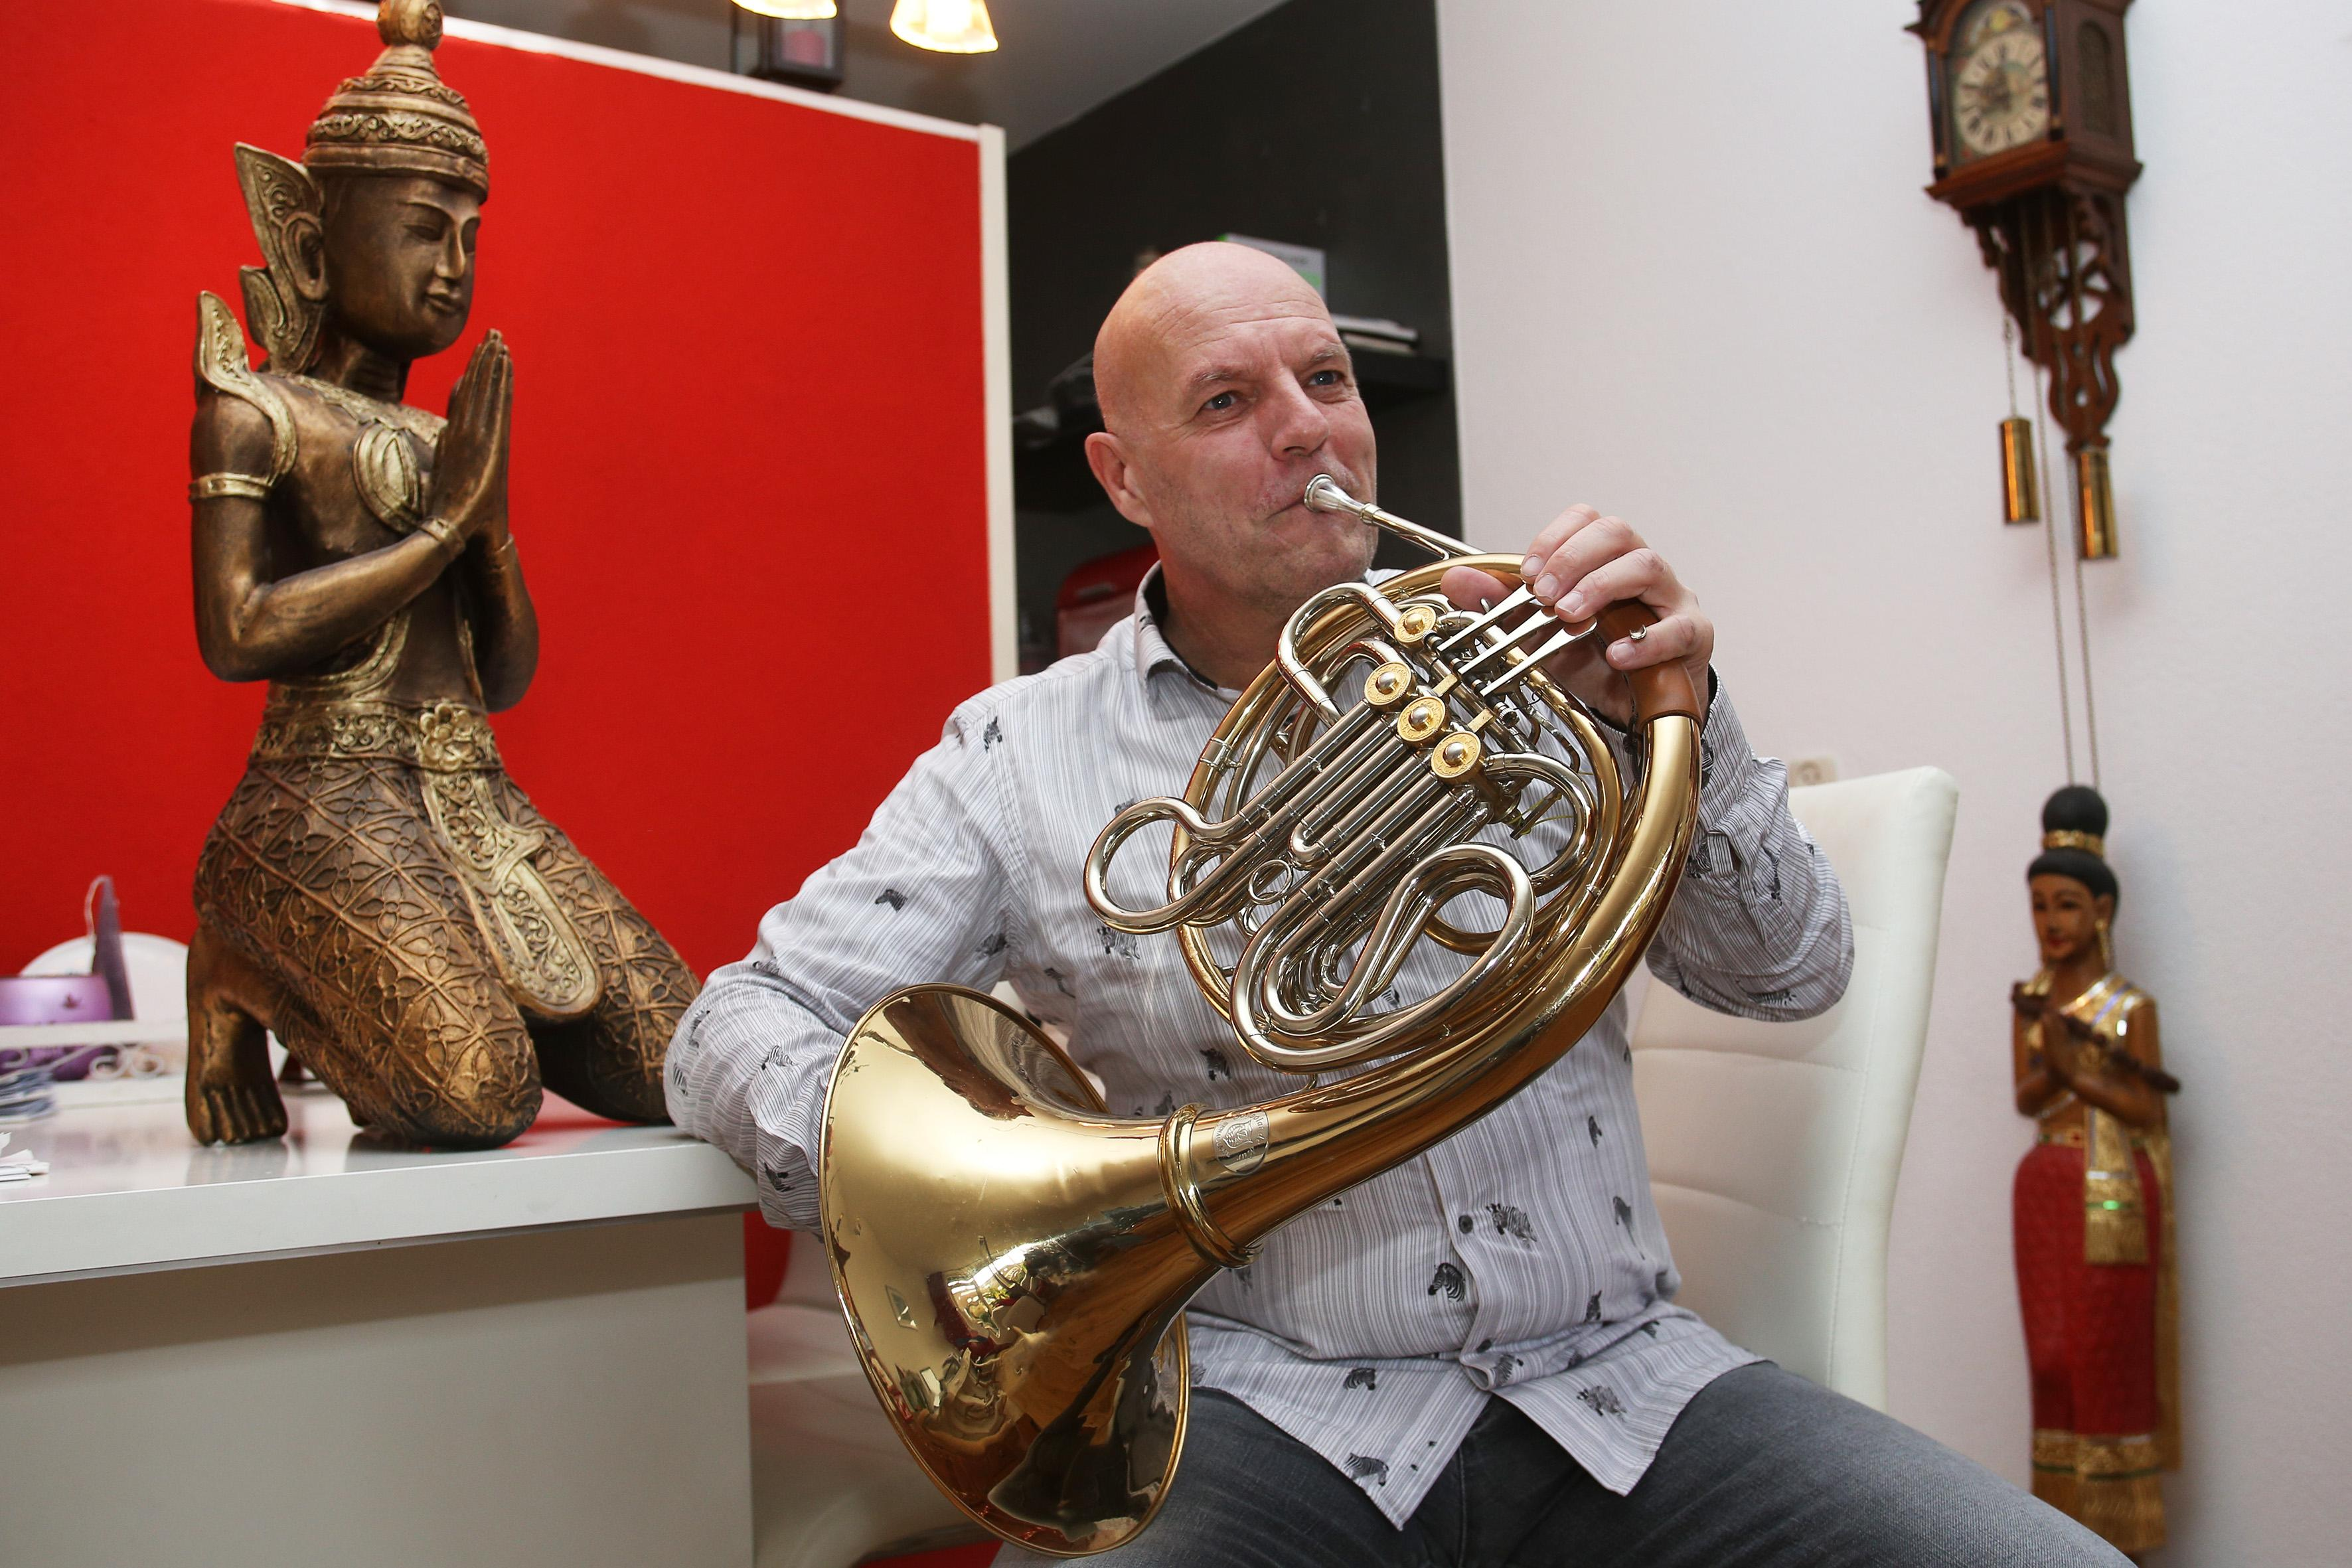 Baarnse hoornist Harry Klaassen op tournee in China